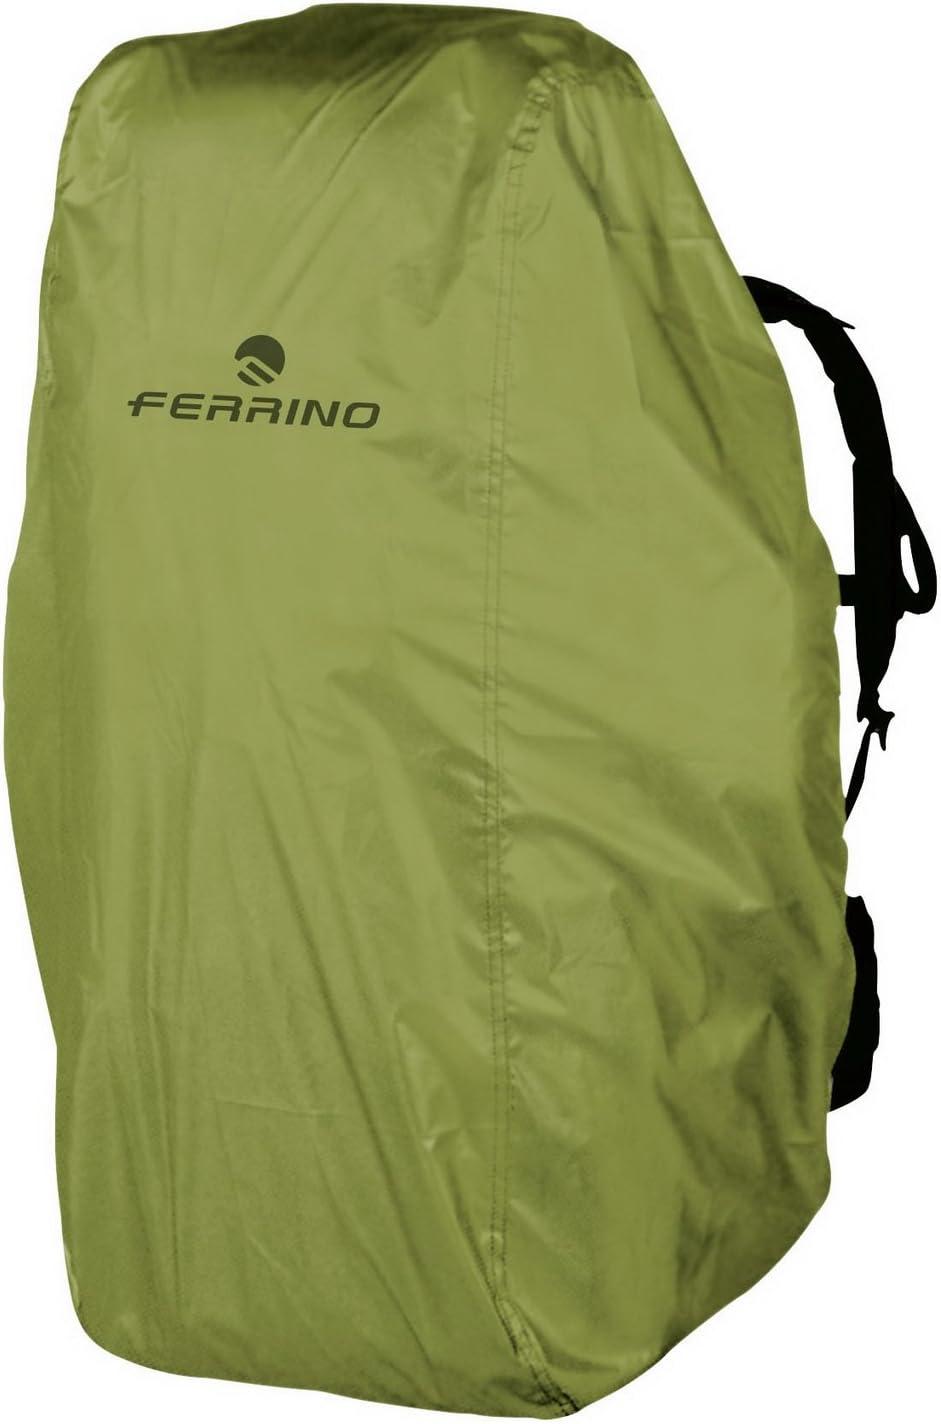 30/l Ferrino Cover 0/Backpack Cover 10 Green